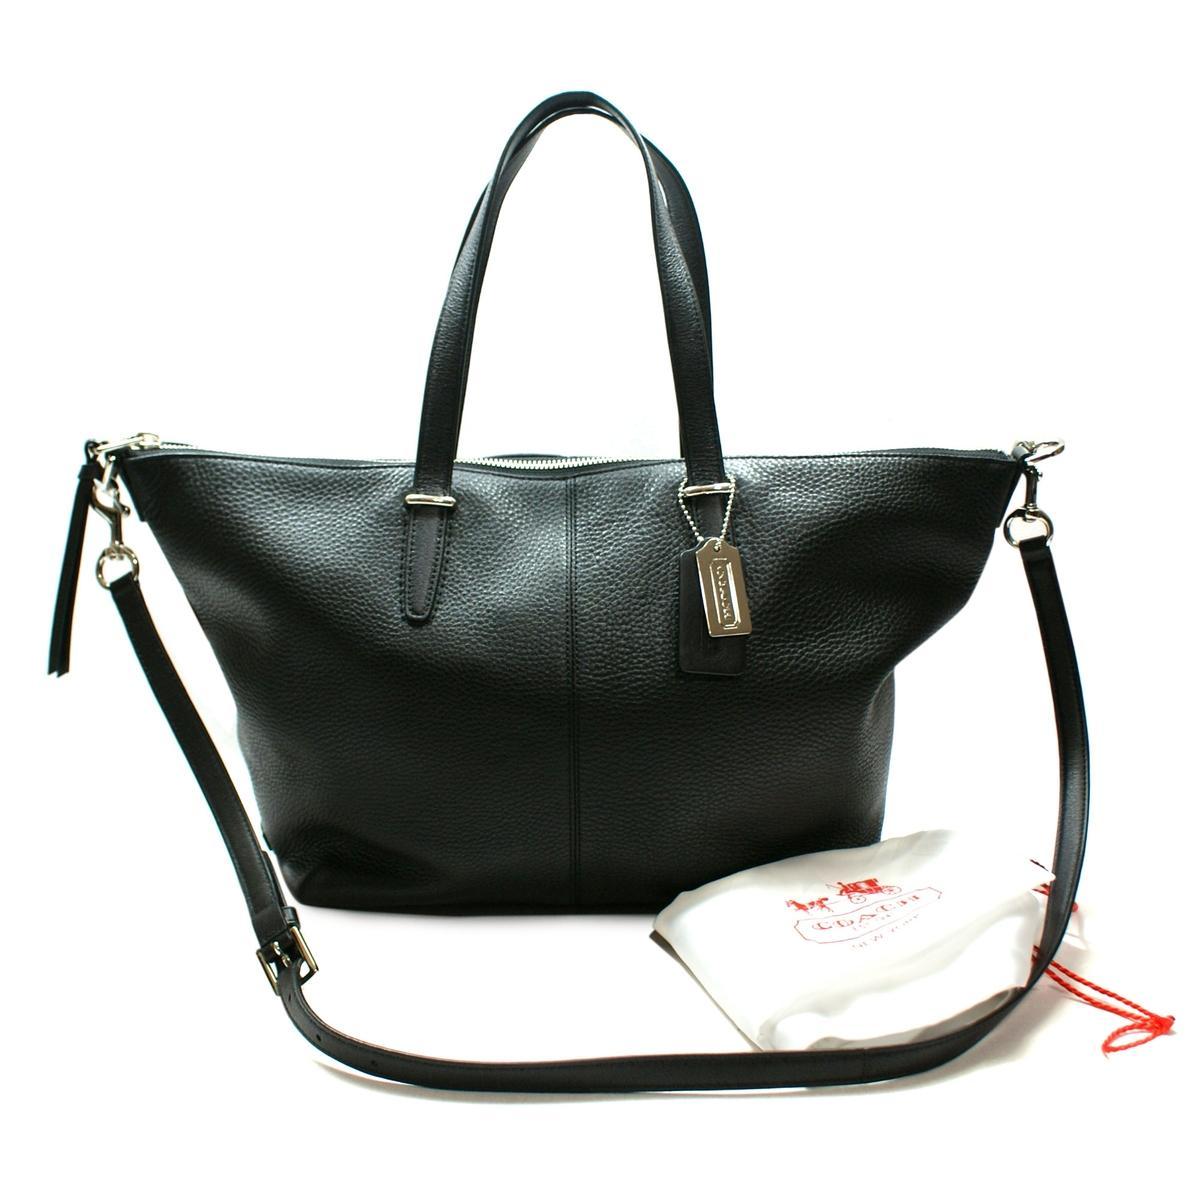 Coach Bleecker Cooper Leather Satchel/ Crossbody Bag Black